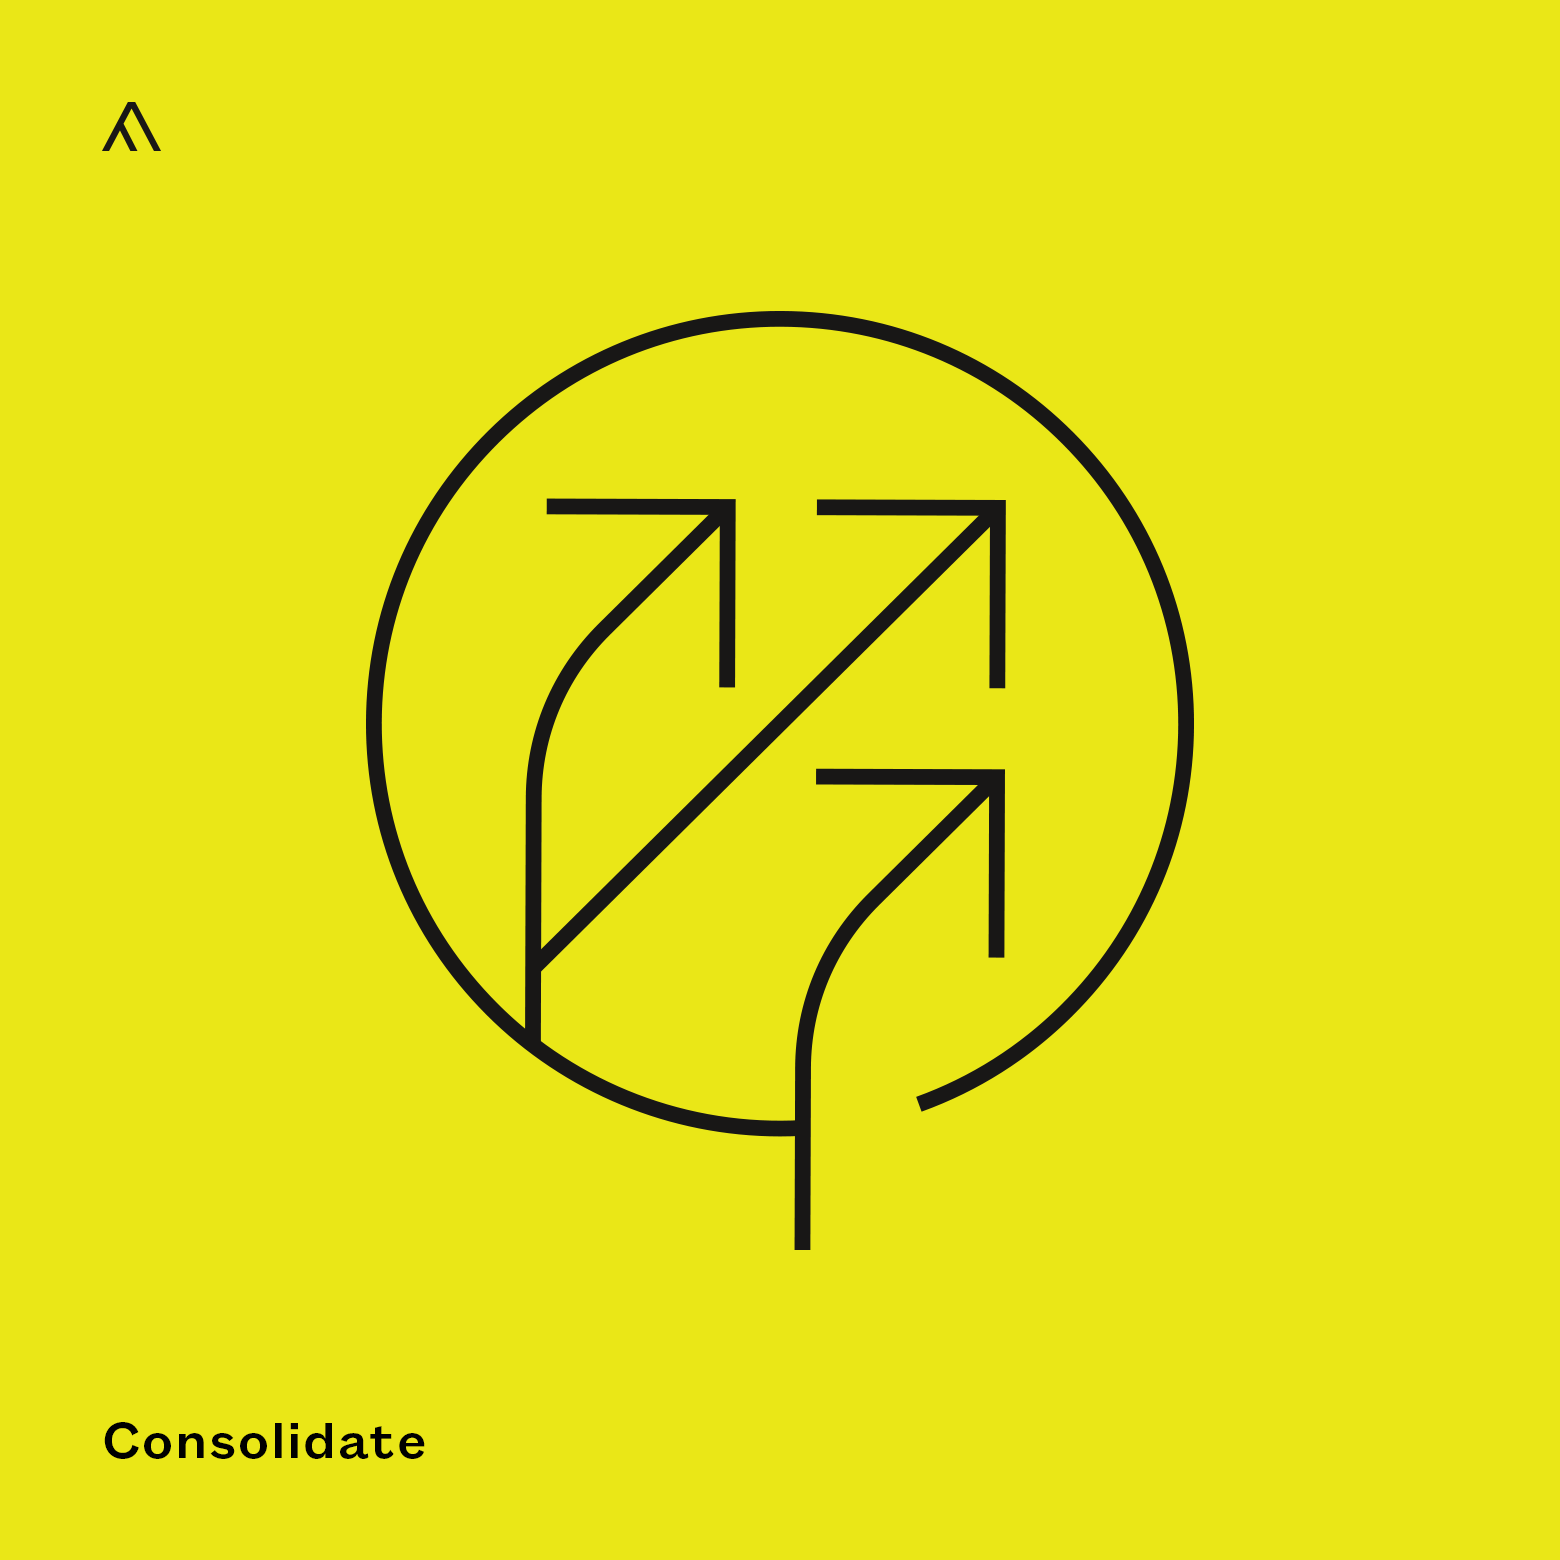 asx-corporatedesign-buero-ink-consolidate